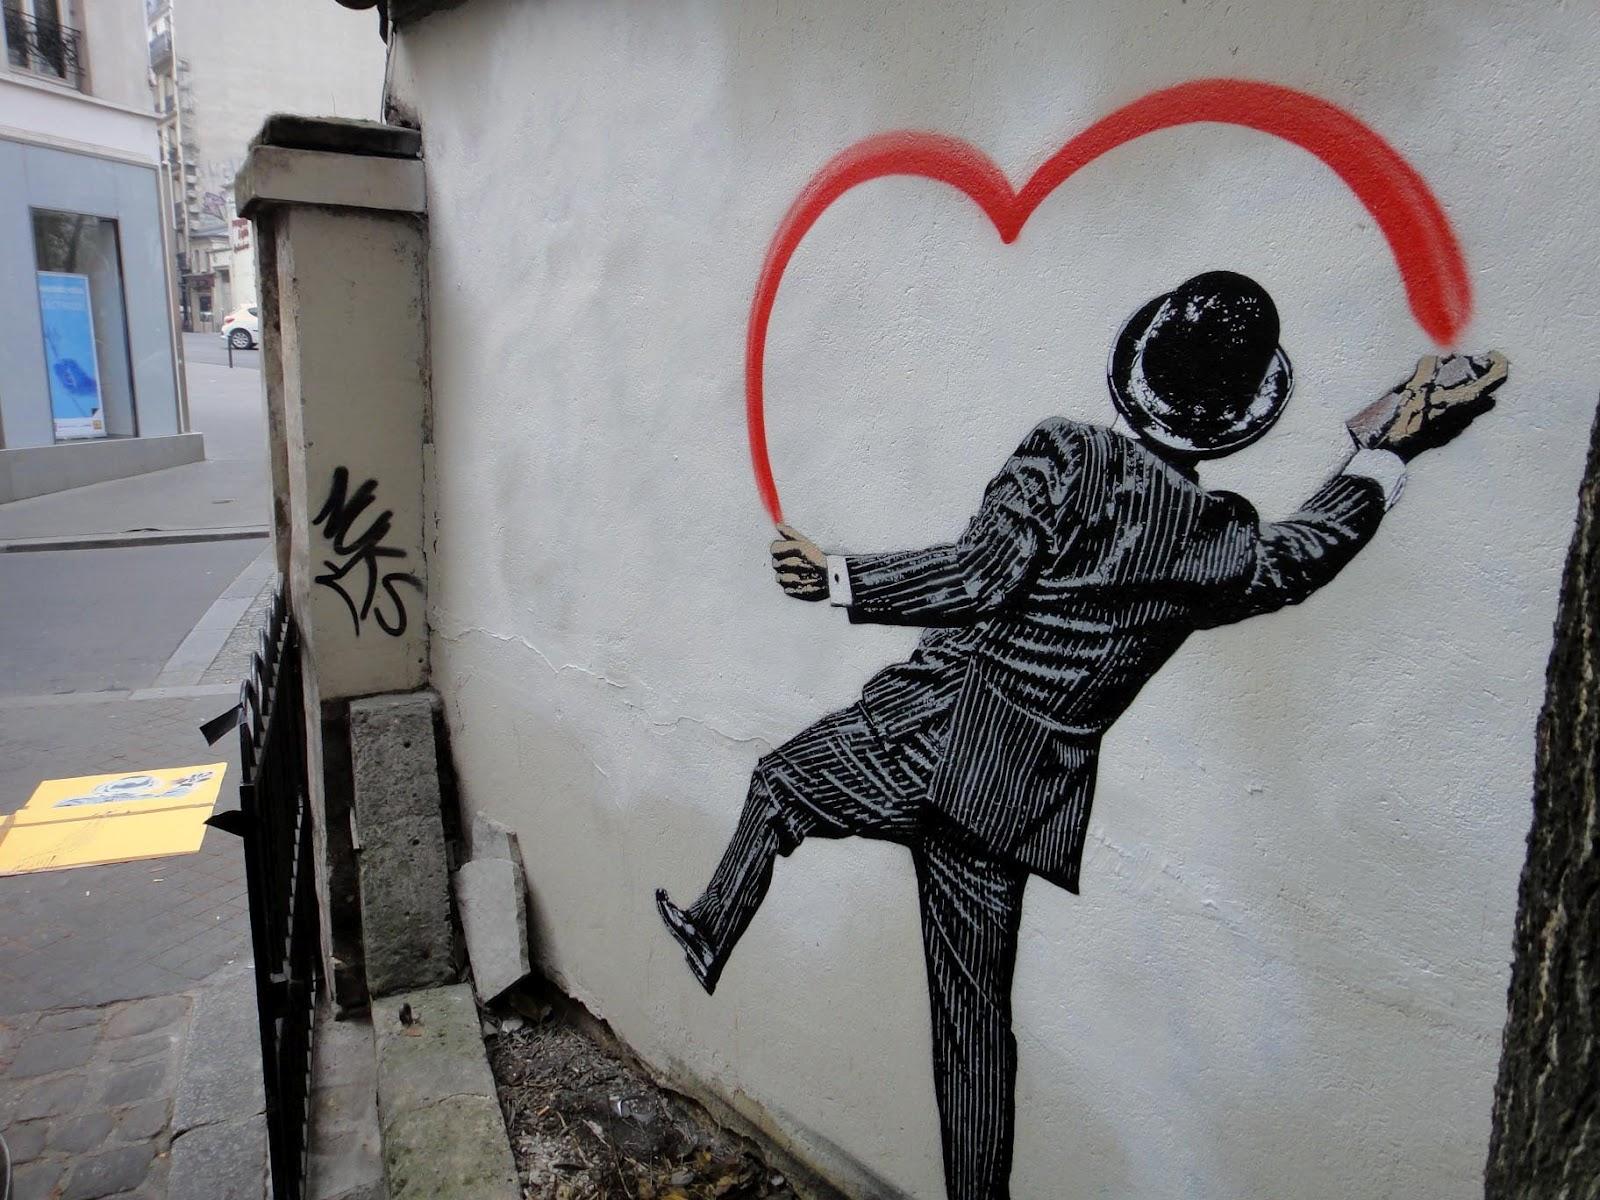 Paris Wall Mural Nick Walker New Mural In Paris Streetartnews Streetartnews